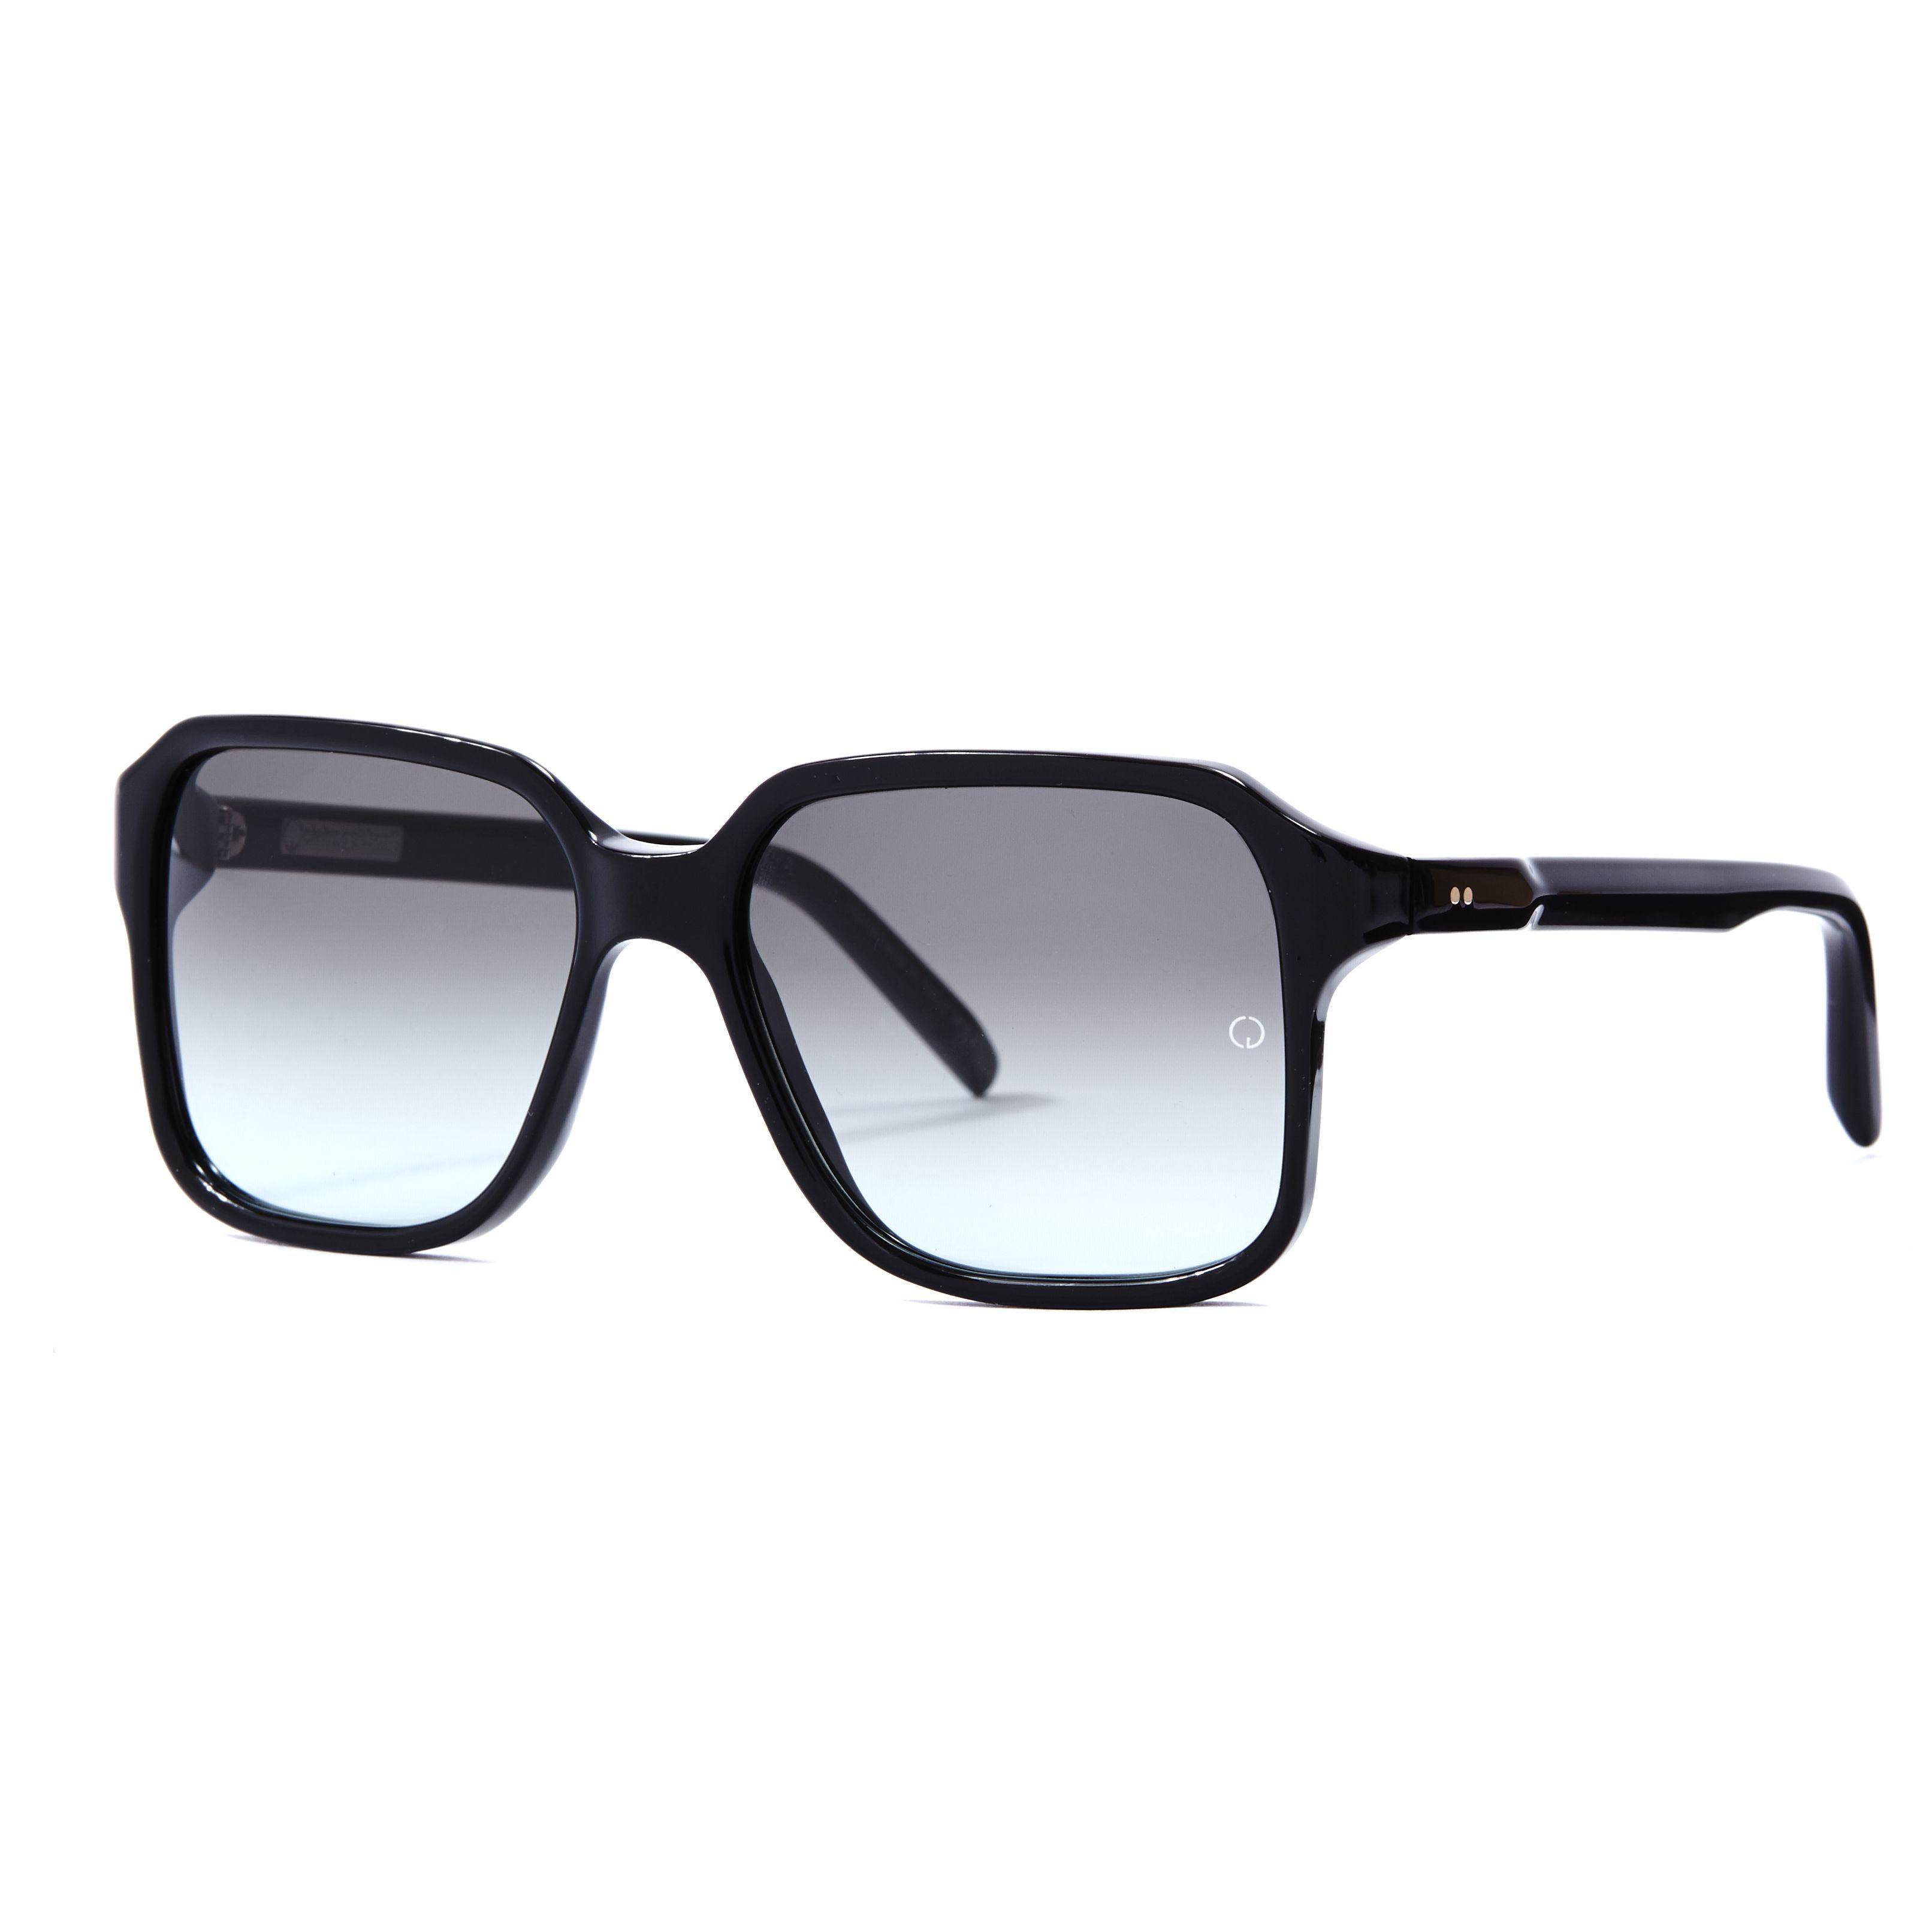 ea047c6fe08 Harris in  Black  Claire Goldsmith Eyewear -  sunglasses  clairegoldsmith   eyewear  british